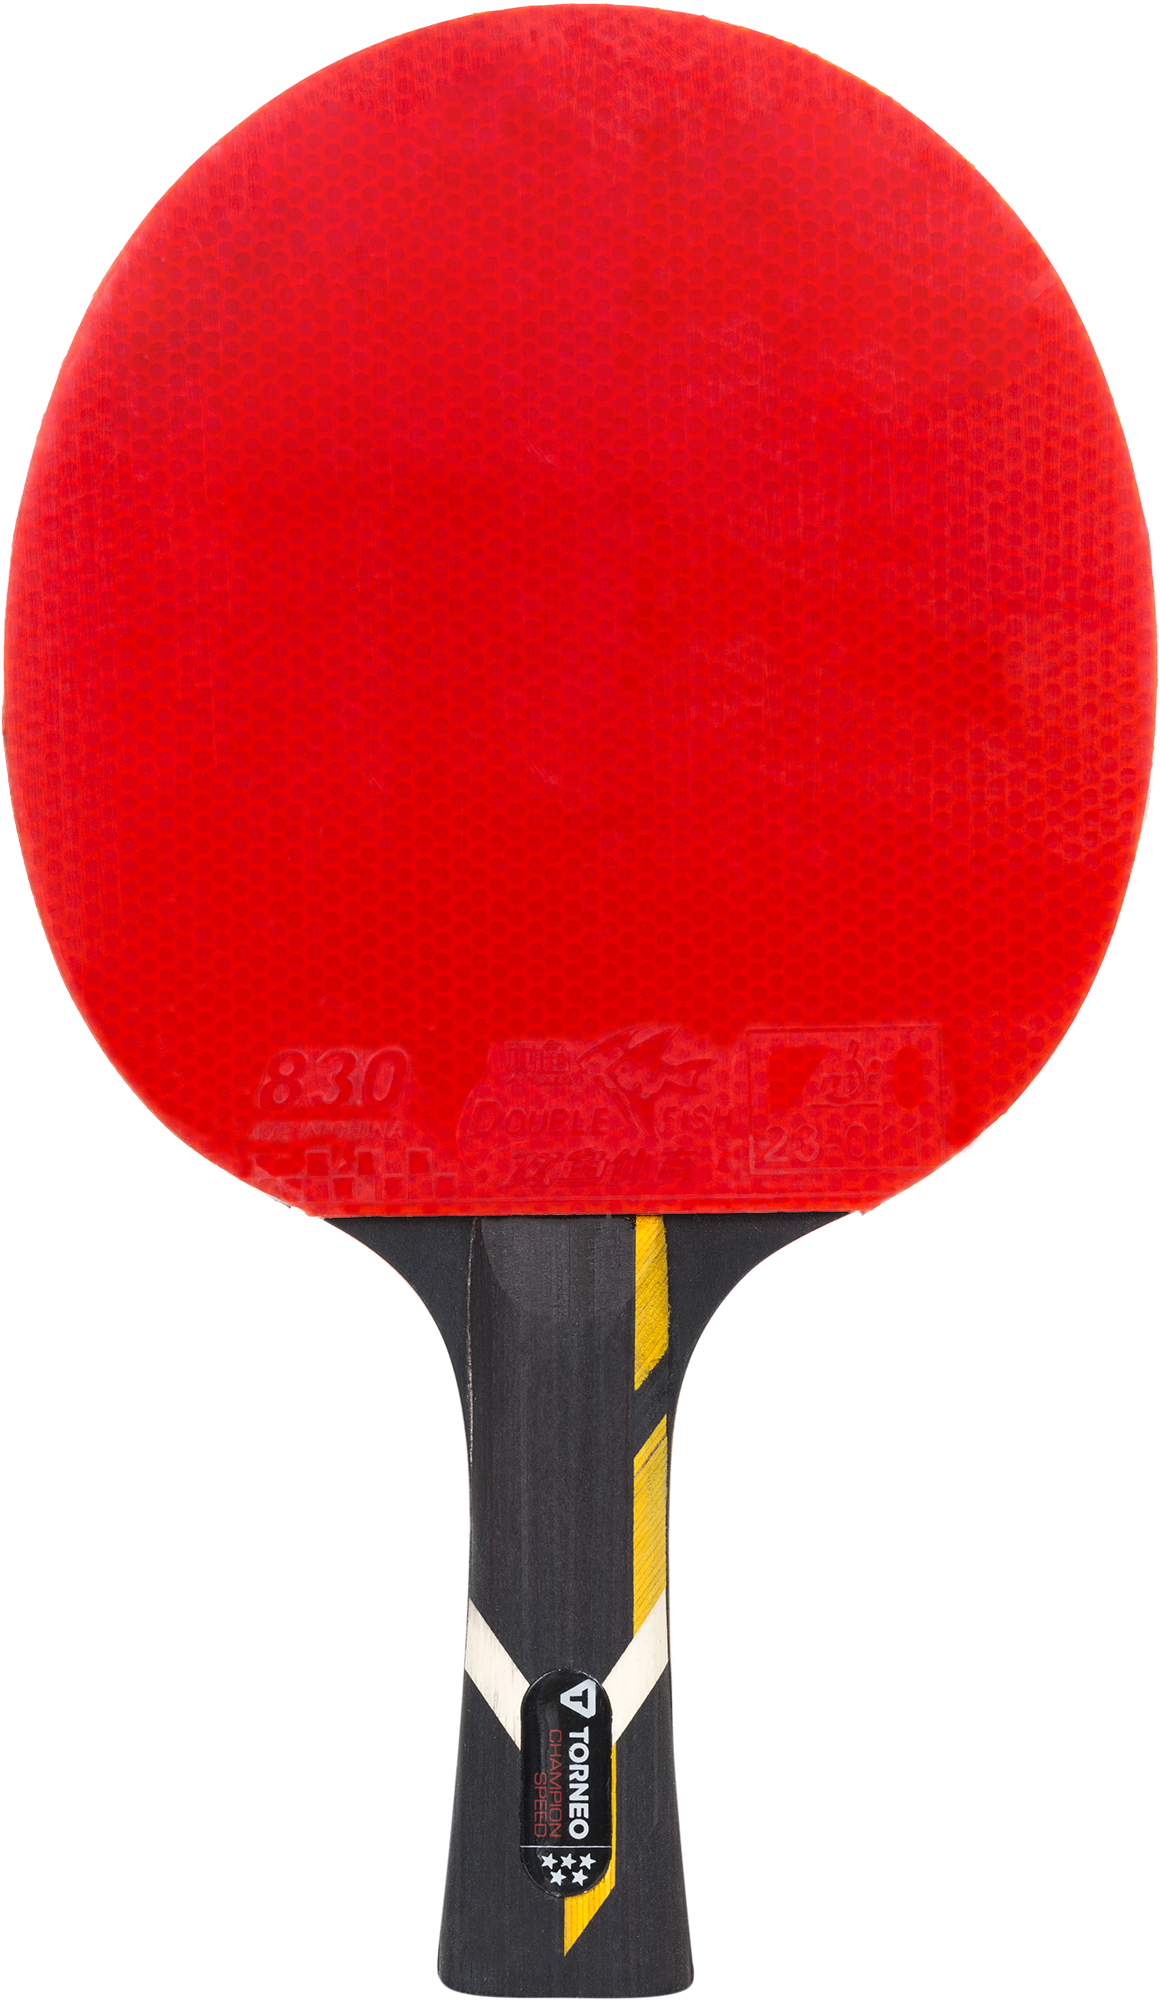 Torneo Ракетка для настольного тенниса Torneo Champion Speed torneo ракетка для настольного тенниса torneo training